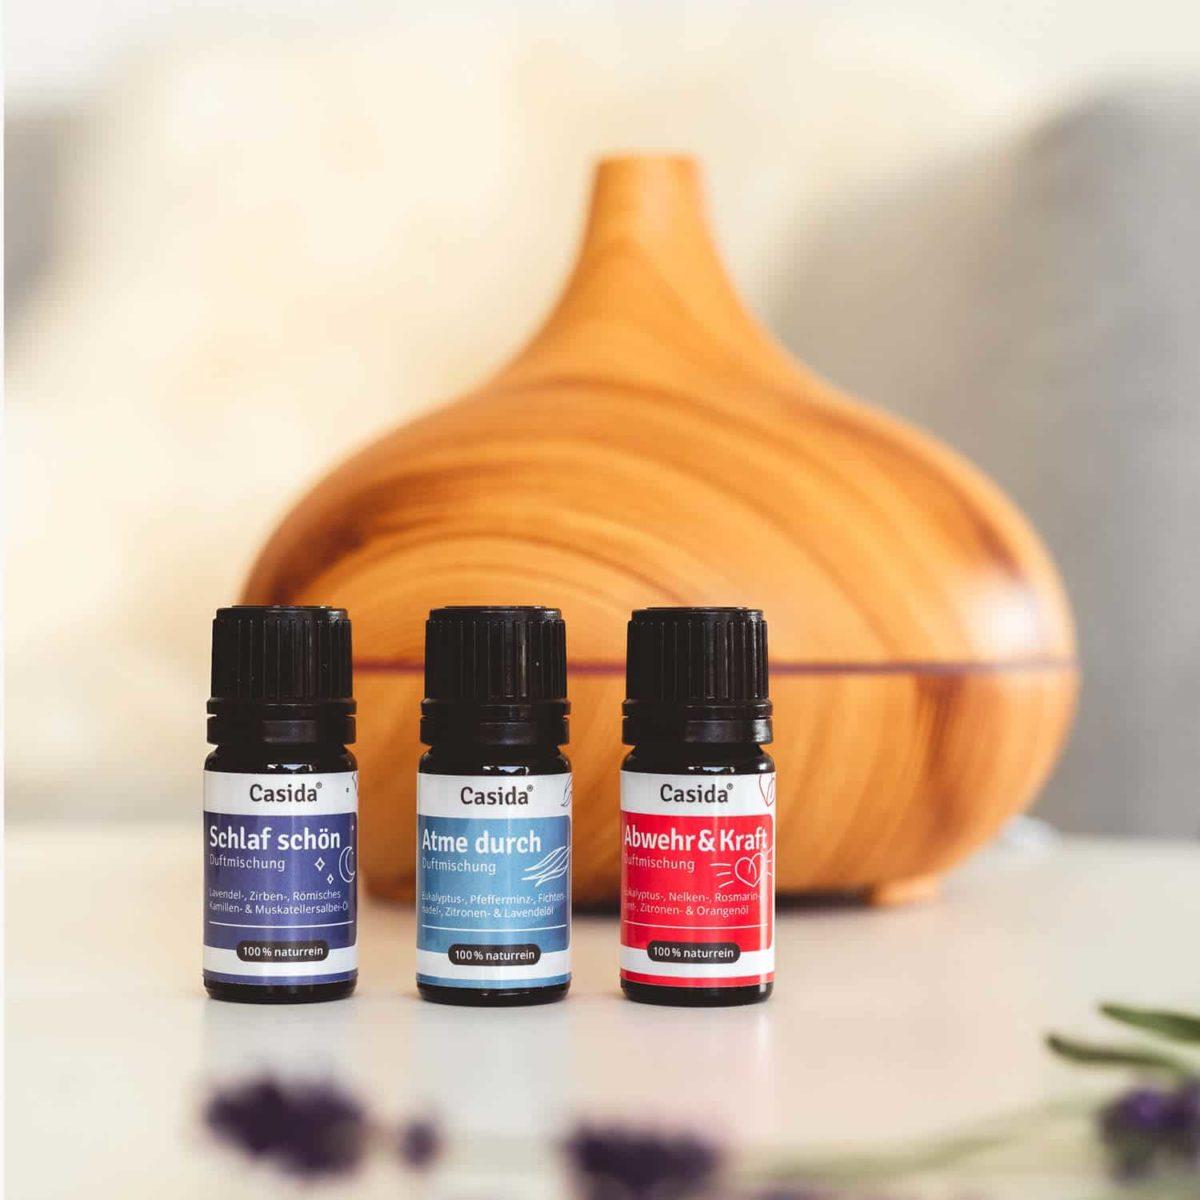 Casida Focusing Aroma-Blend Konzentration & Fokus - 5 ml 17377200 PZN Apotheke Energie Gedächtnis Aromatherapie Aromapflege Aromaschmuck Diffuser8